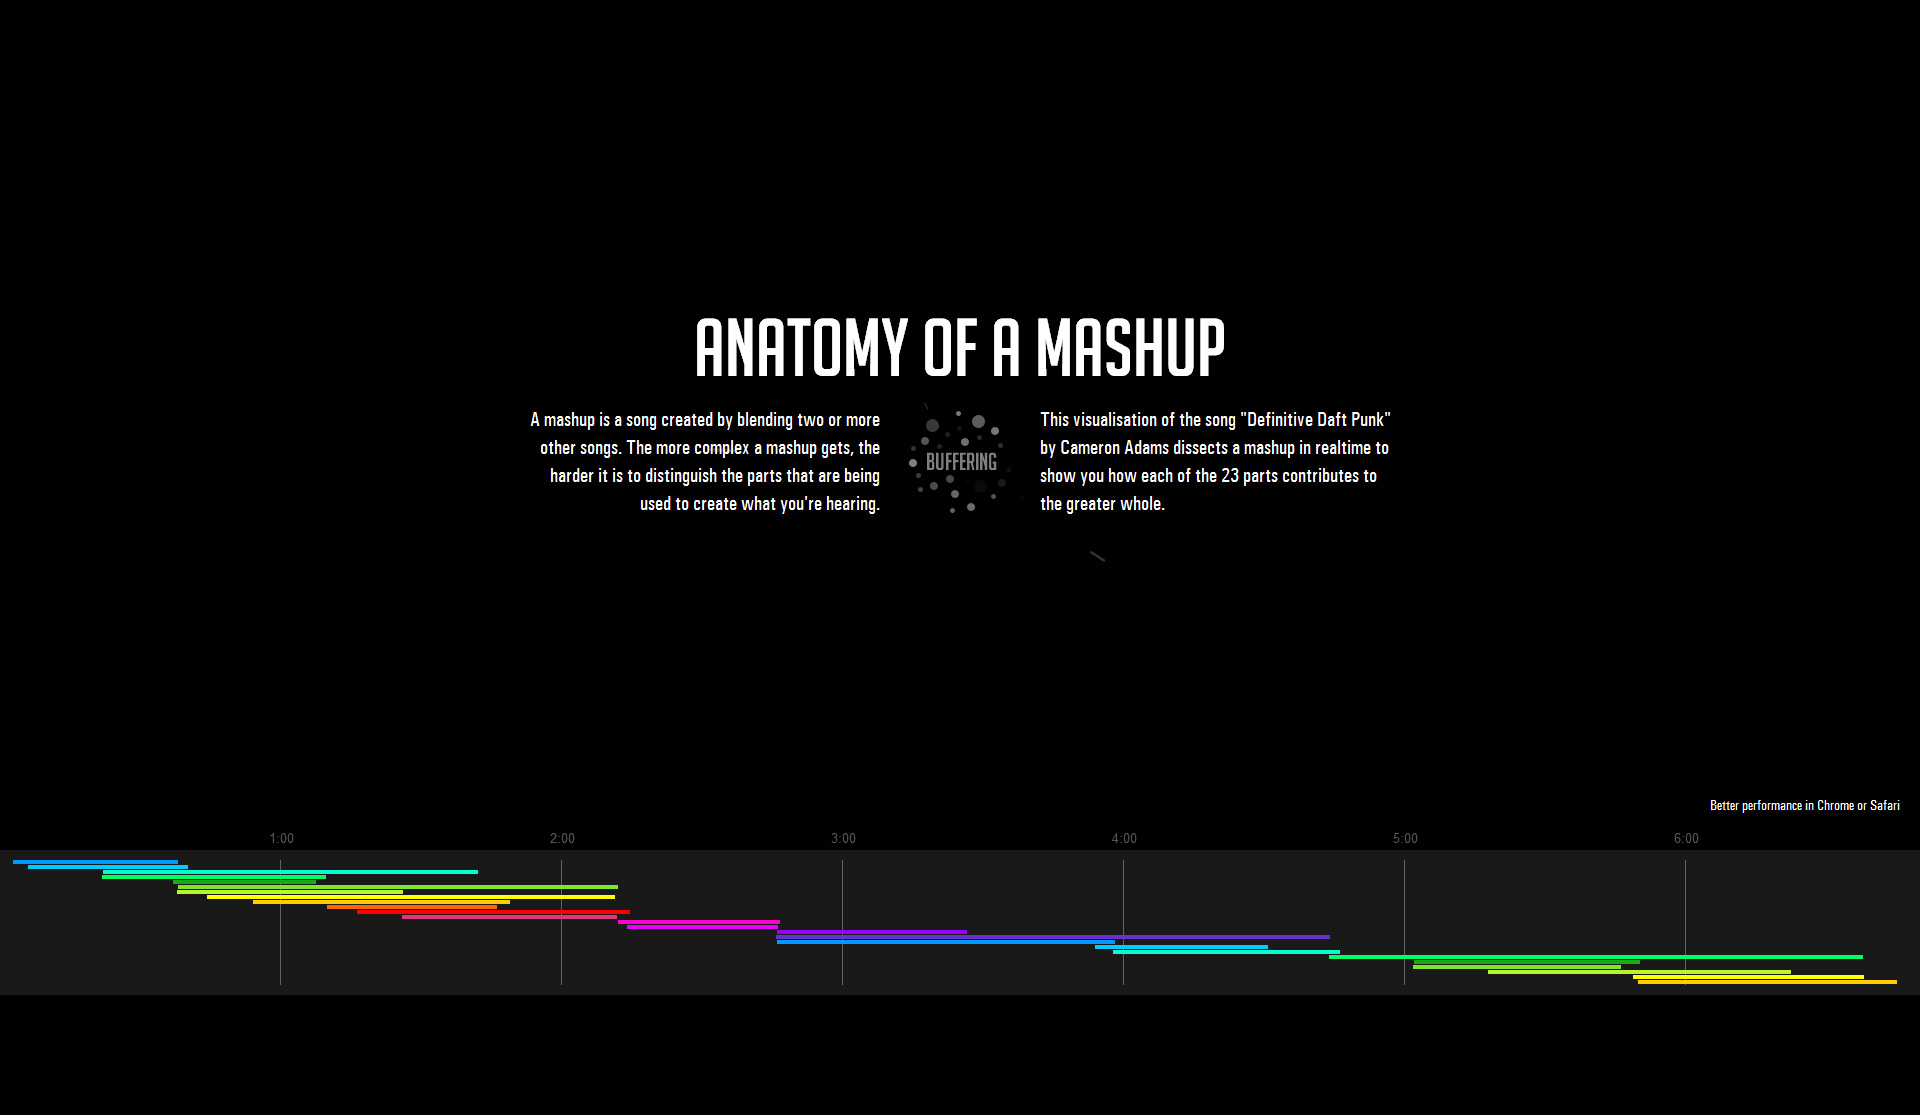 Anatomy of a mashup